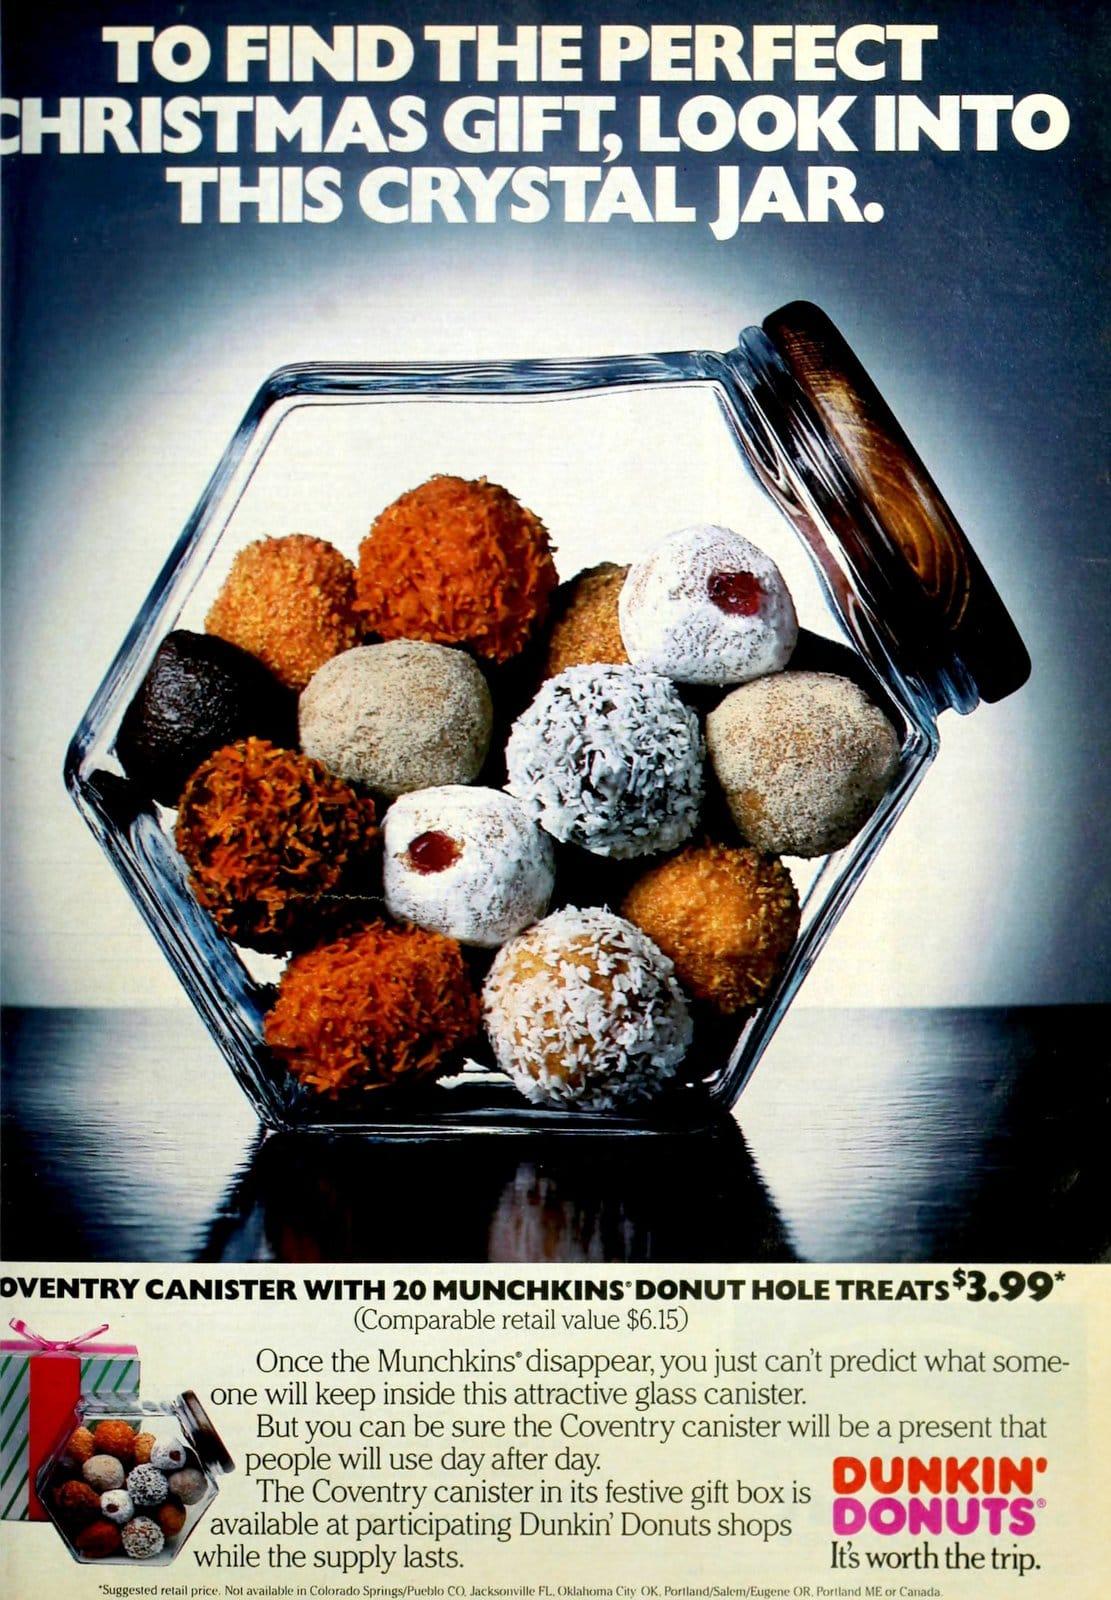 Dunkin' Donuts Munchkins - Christmas crystal jar ad (1985)